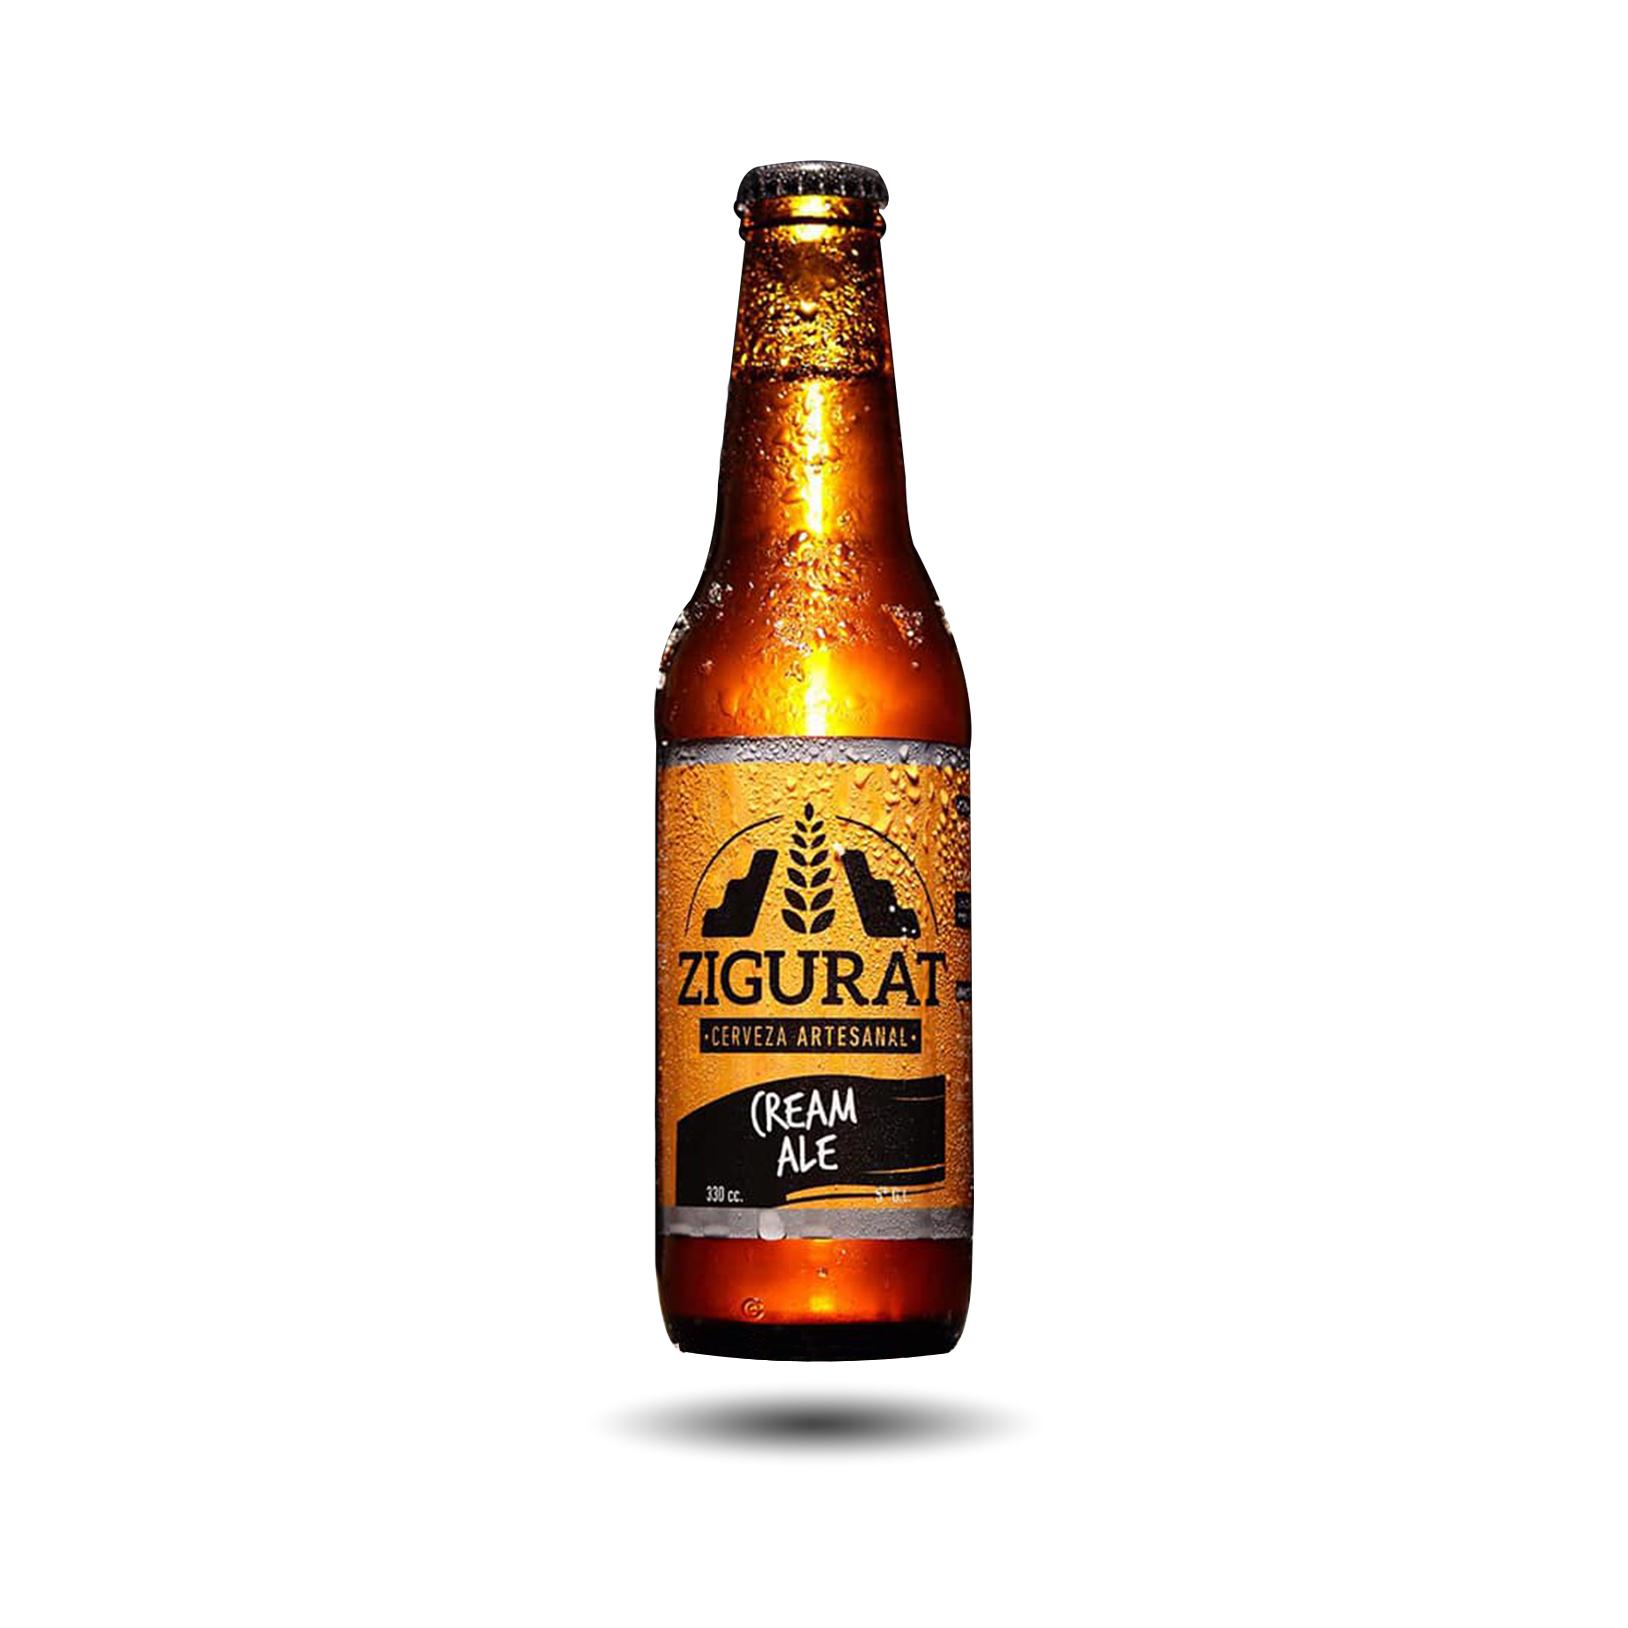 Zigurat - Cream Ale